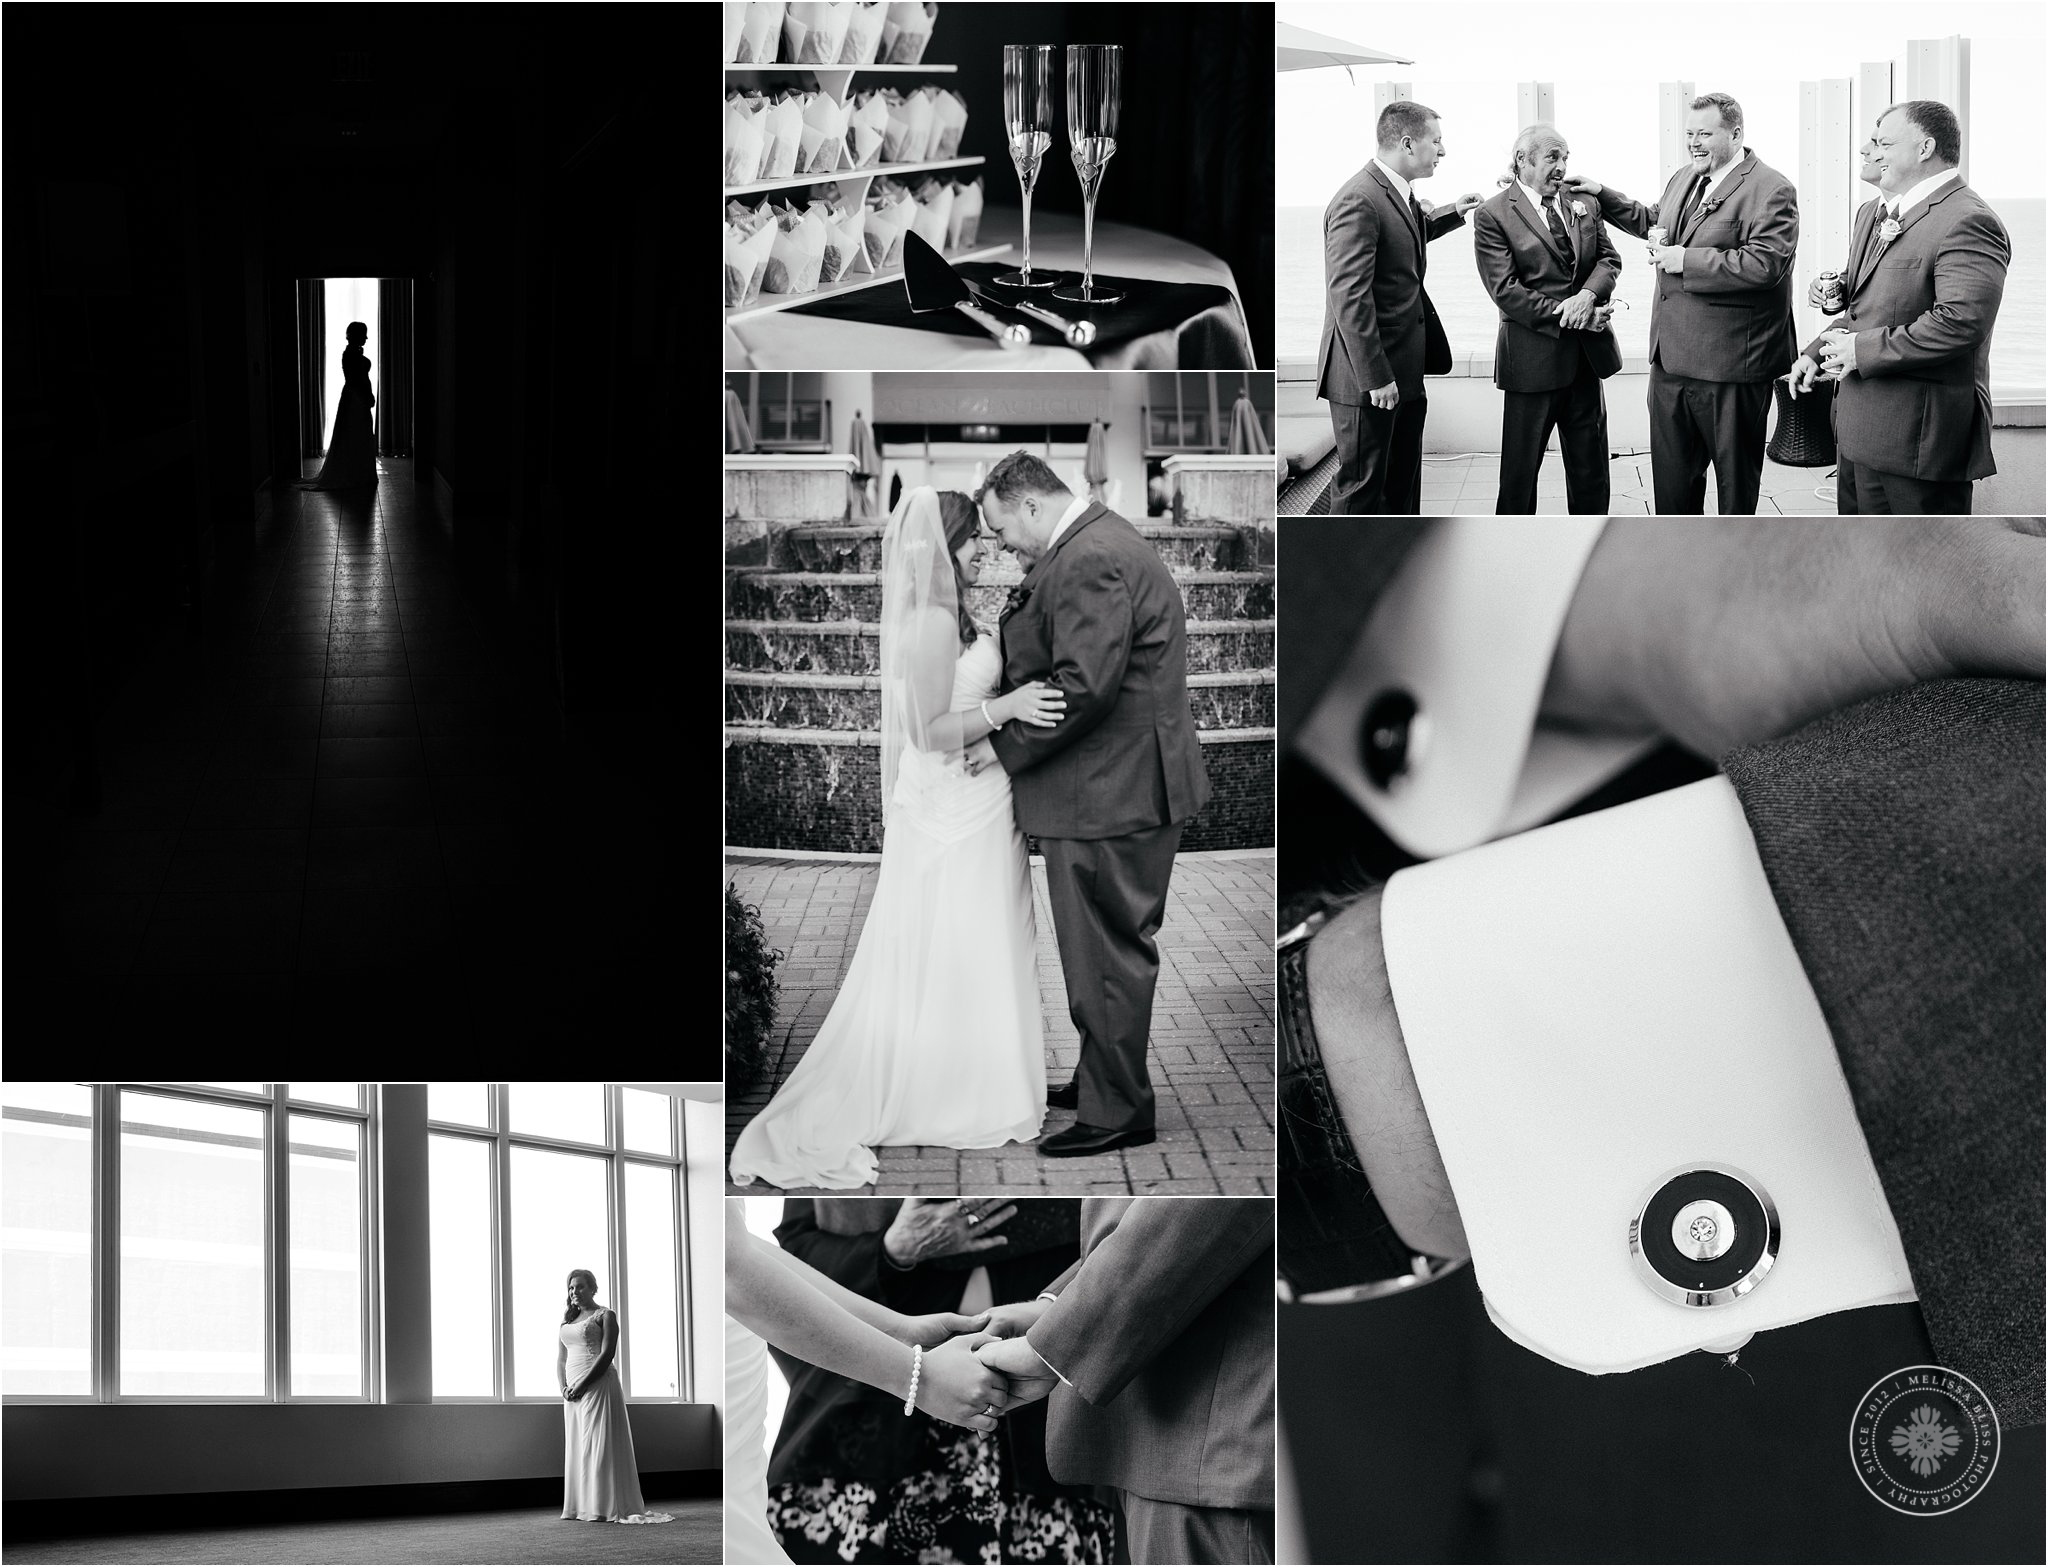 virginia-beach-norfolk-wedding-photographers-beach-wedding-inspiration-melissa-bliss-photography-hampton-roads-wedding-photographer